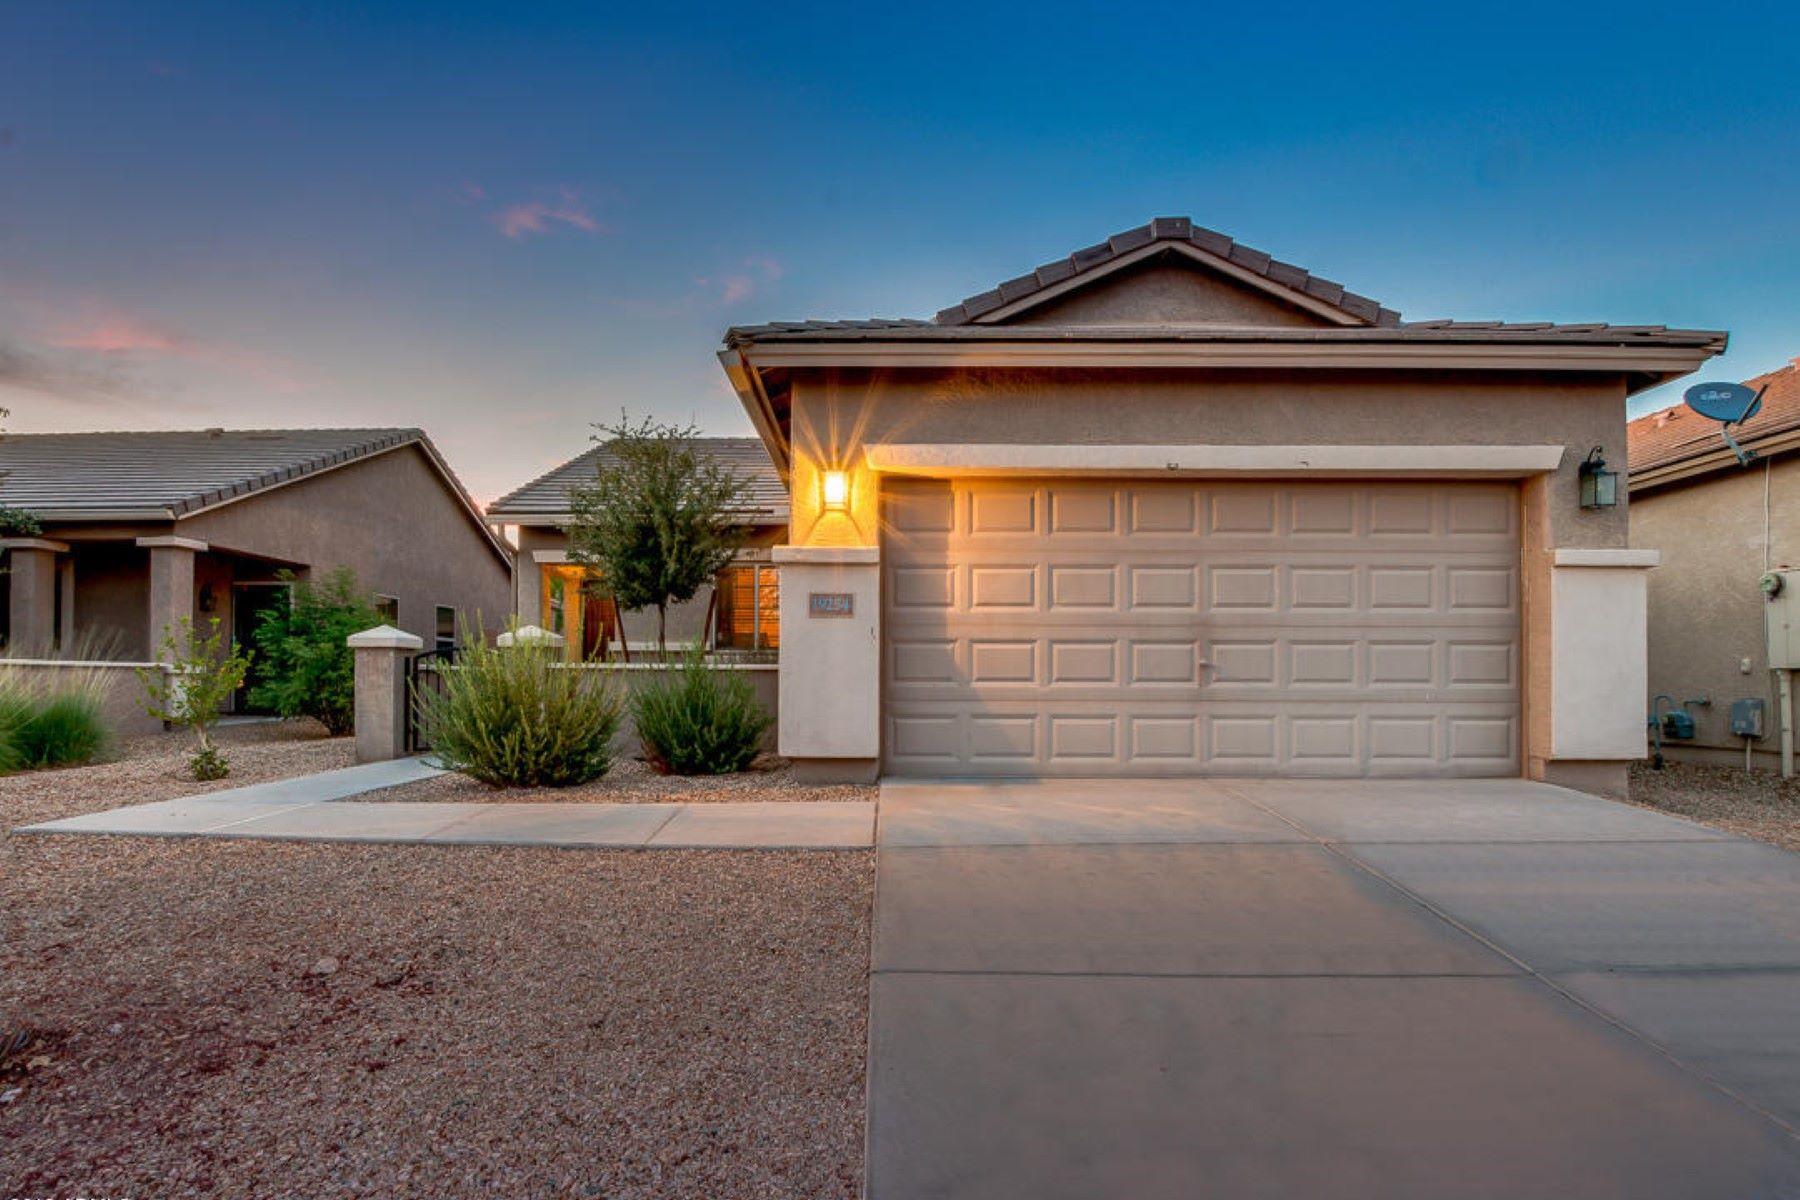 Single Family Homes for Sale at Vista De Montana 19254 W Monroe St Buckeye, Arizona 85326 United States